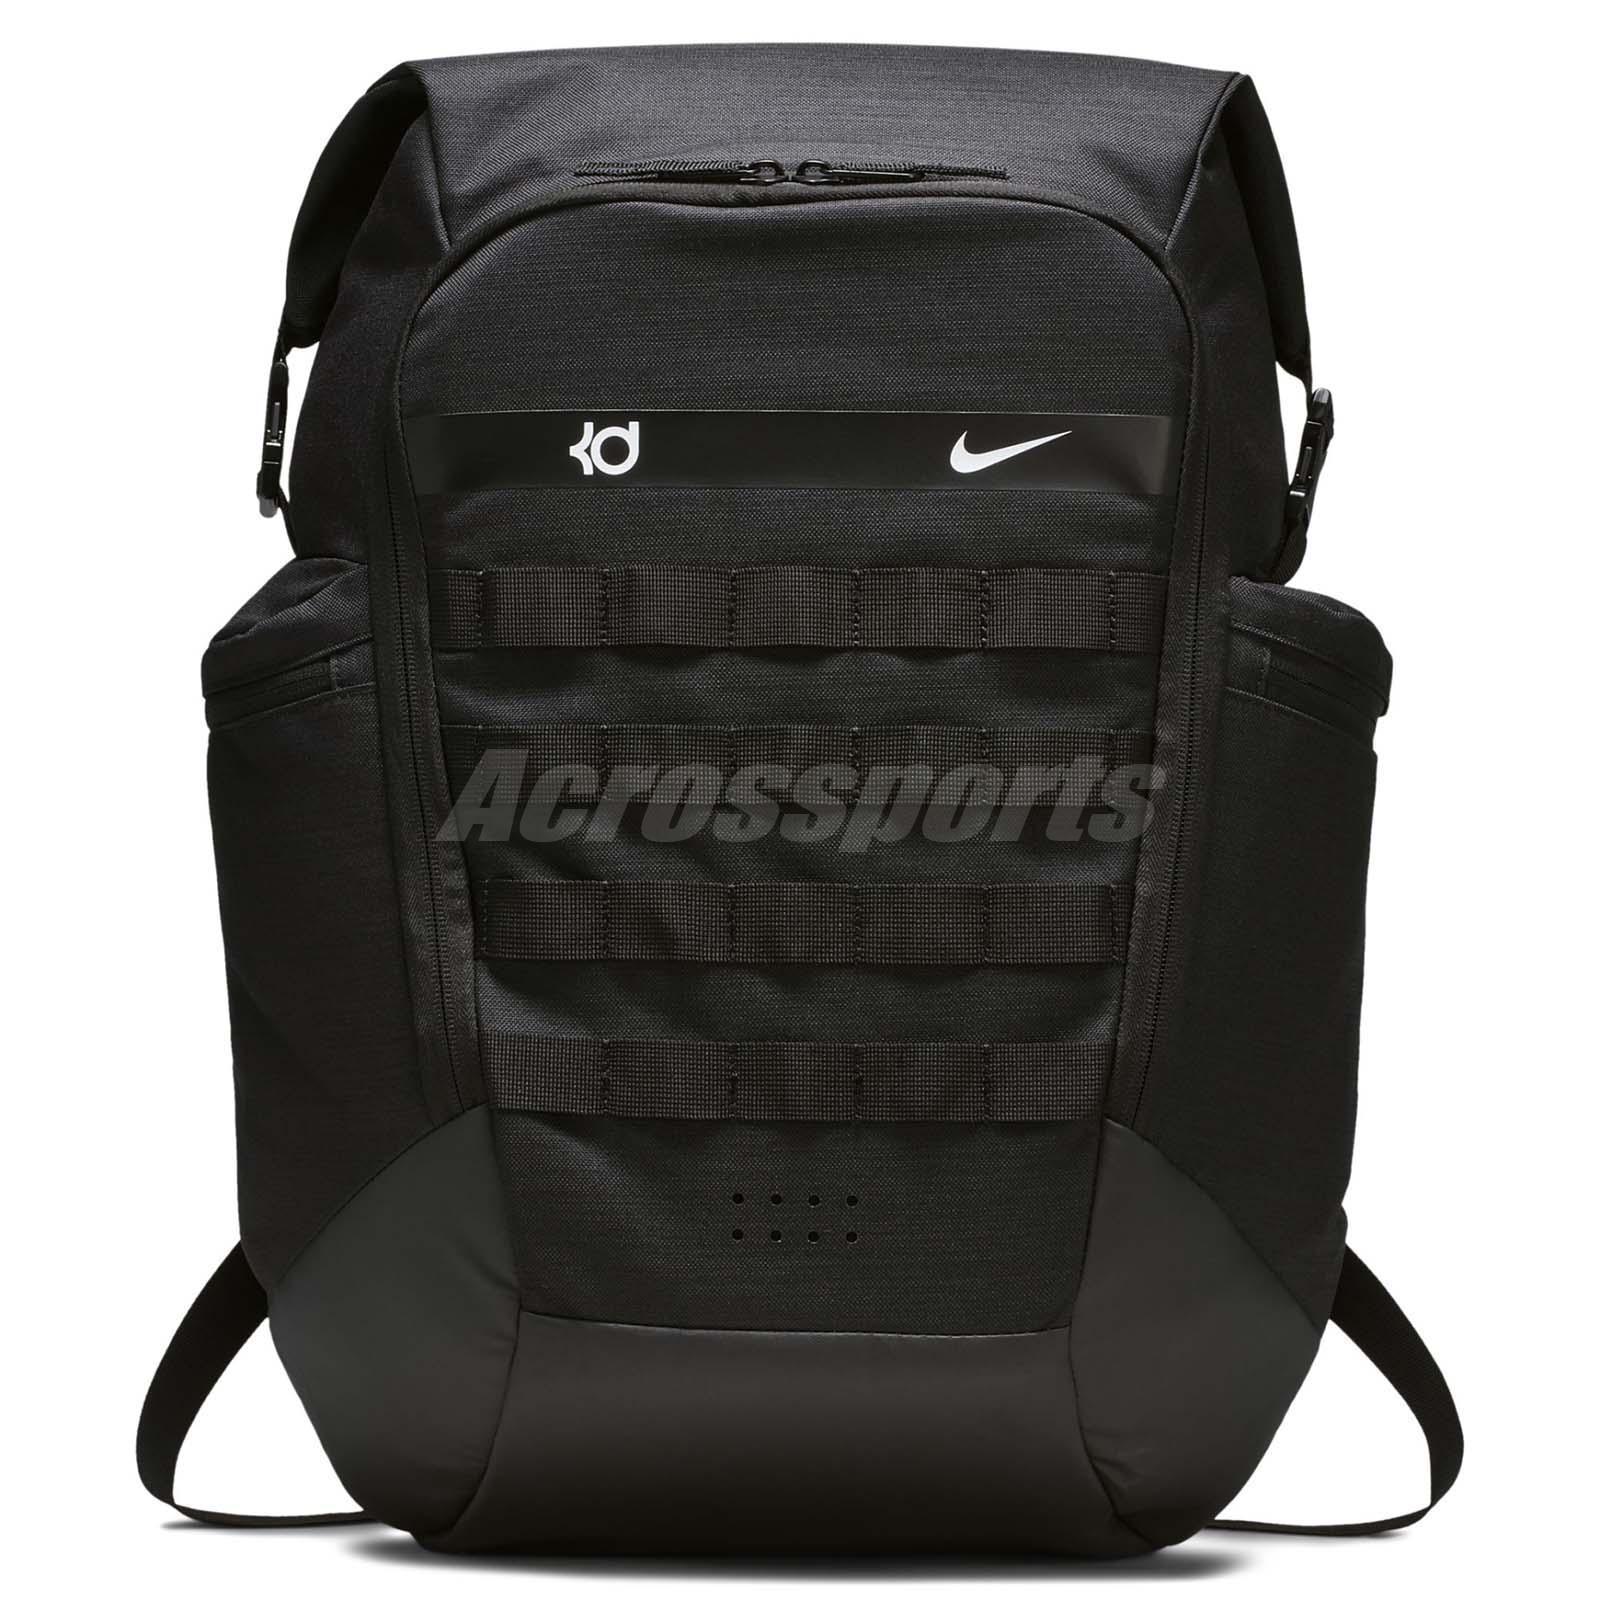 b7fdb9d98250 Nike KD Trey 6 Backpack Kevin Durant Basketball Gym Bucket Bag Black  BA5551-010